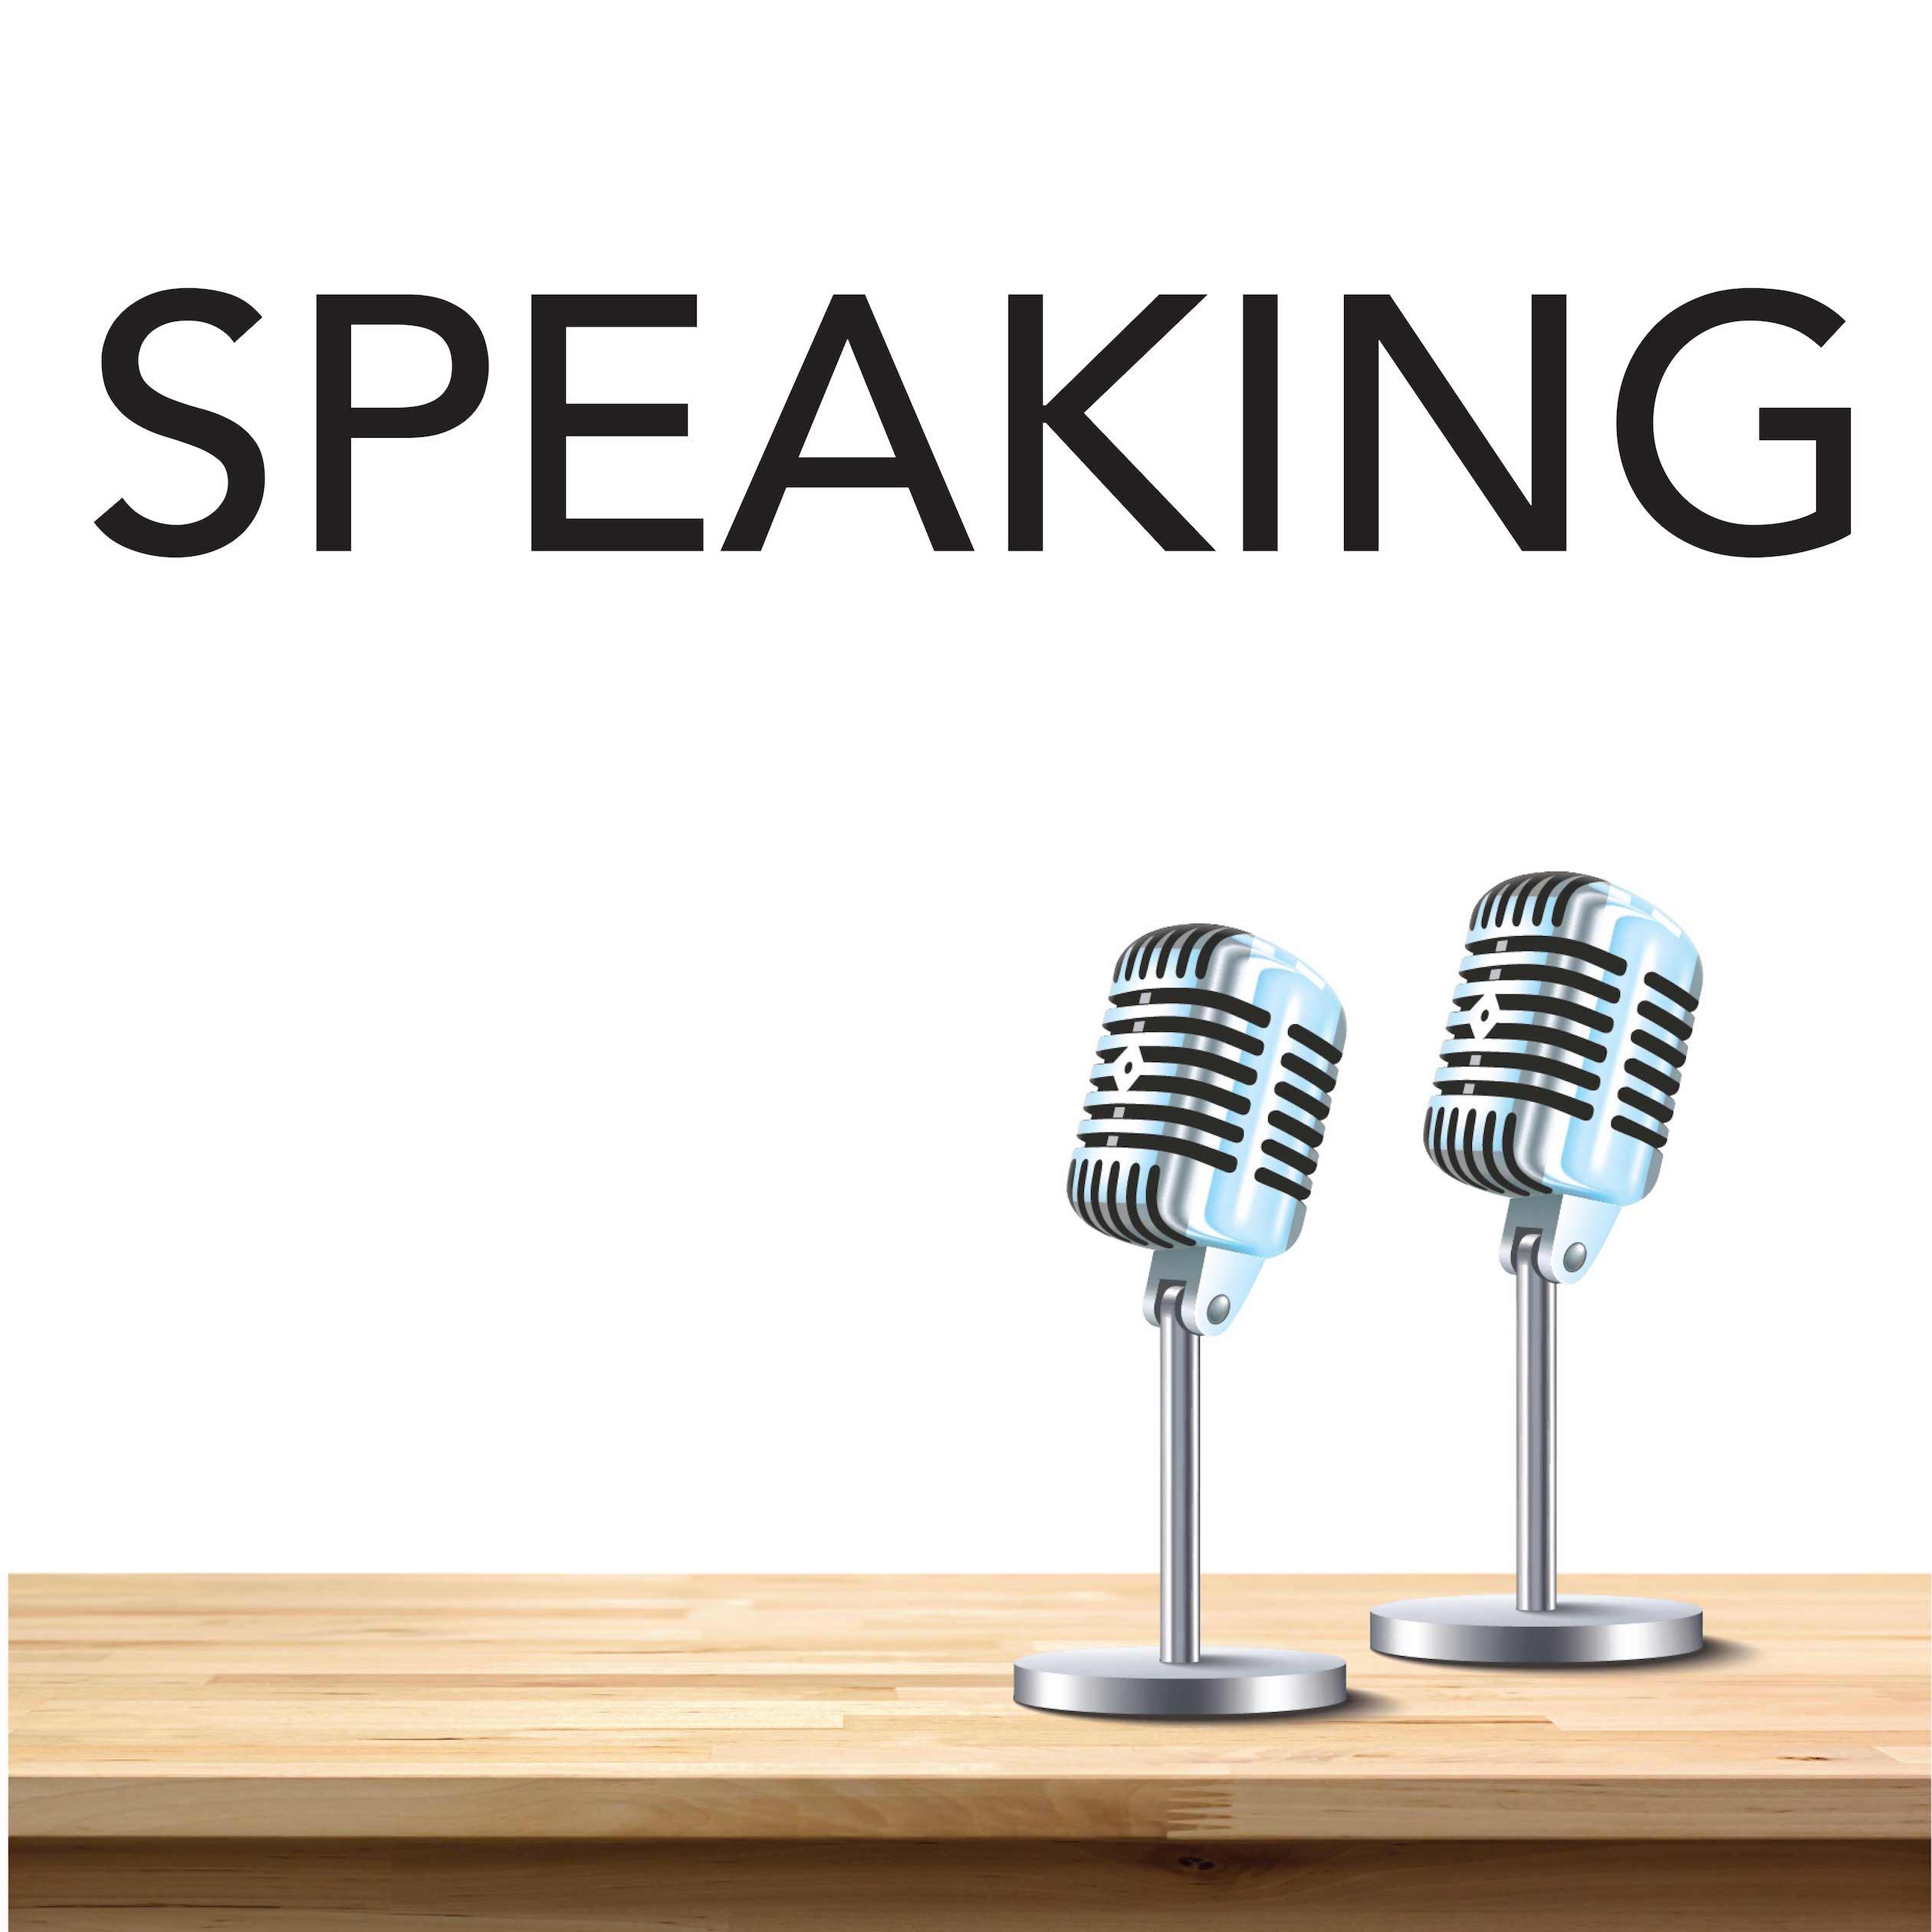 SpeakingOption2-1